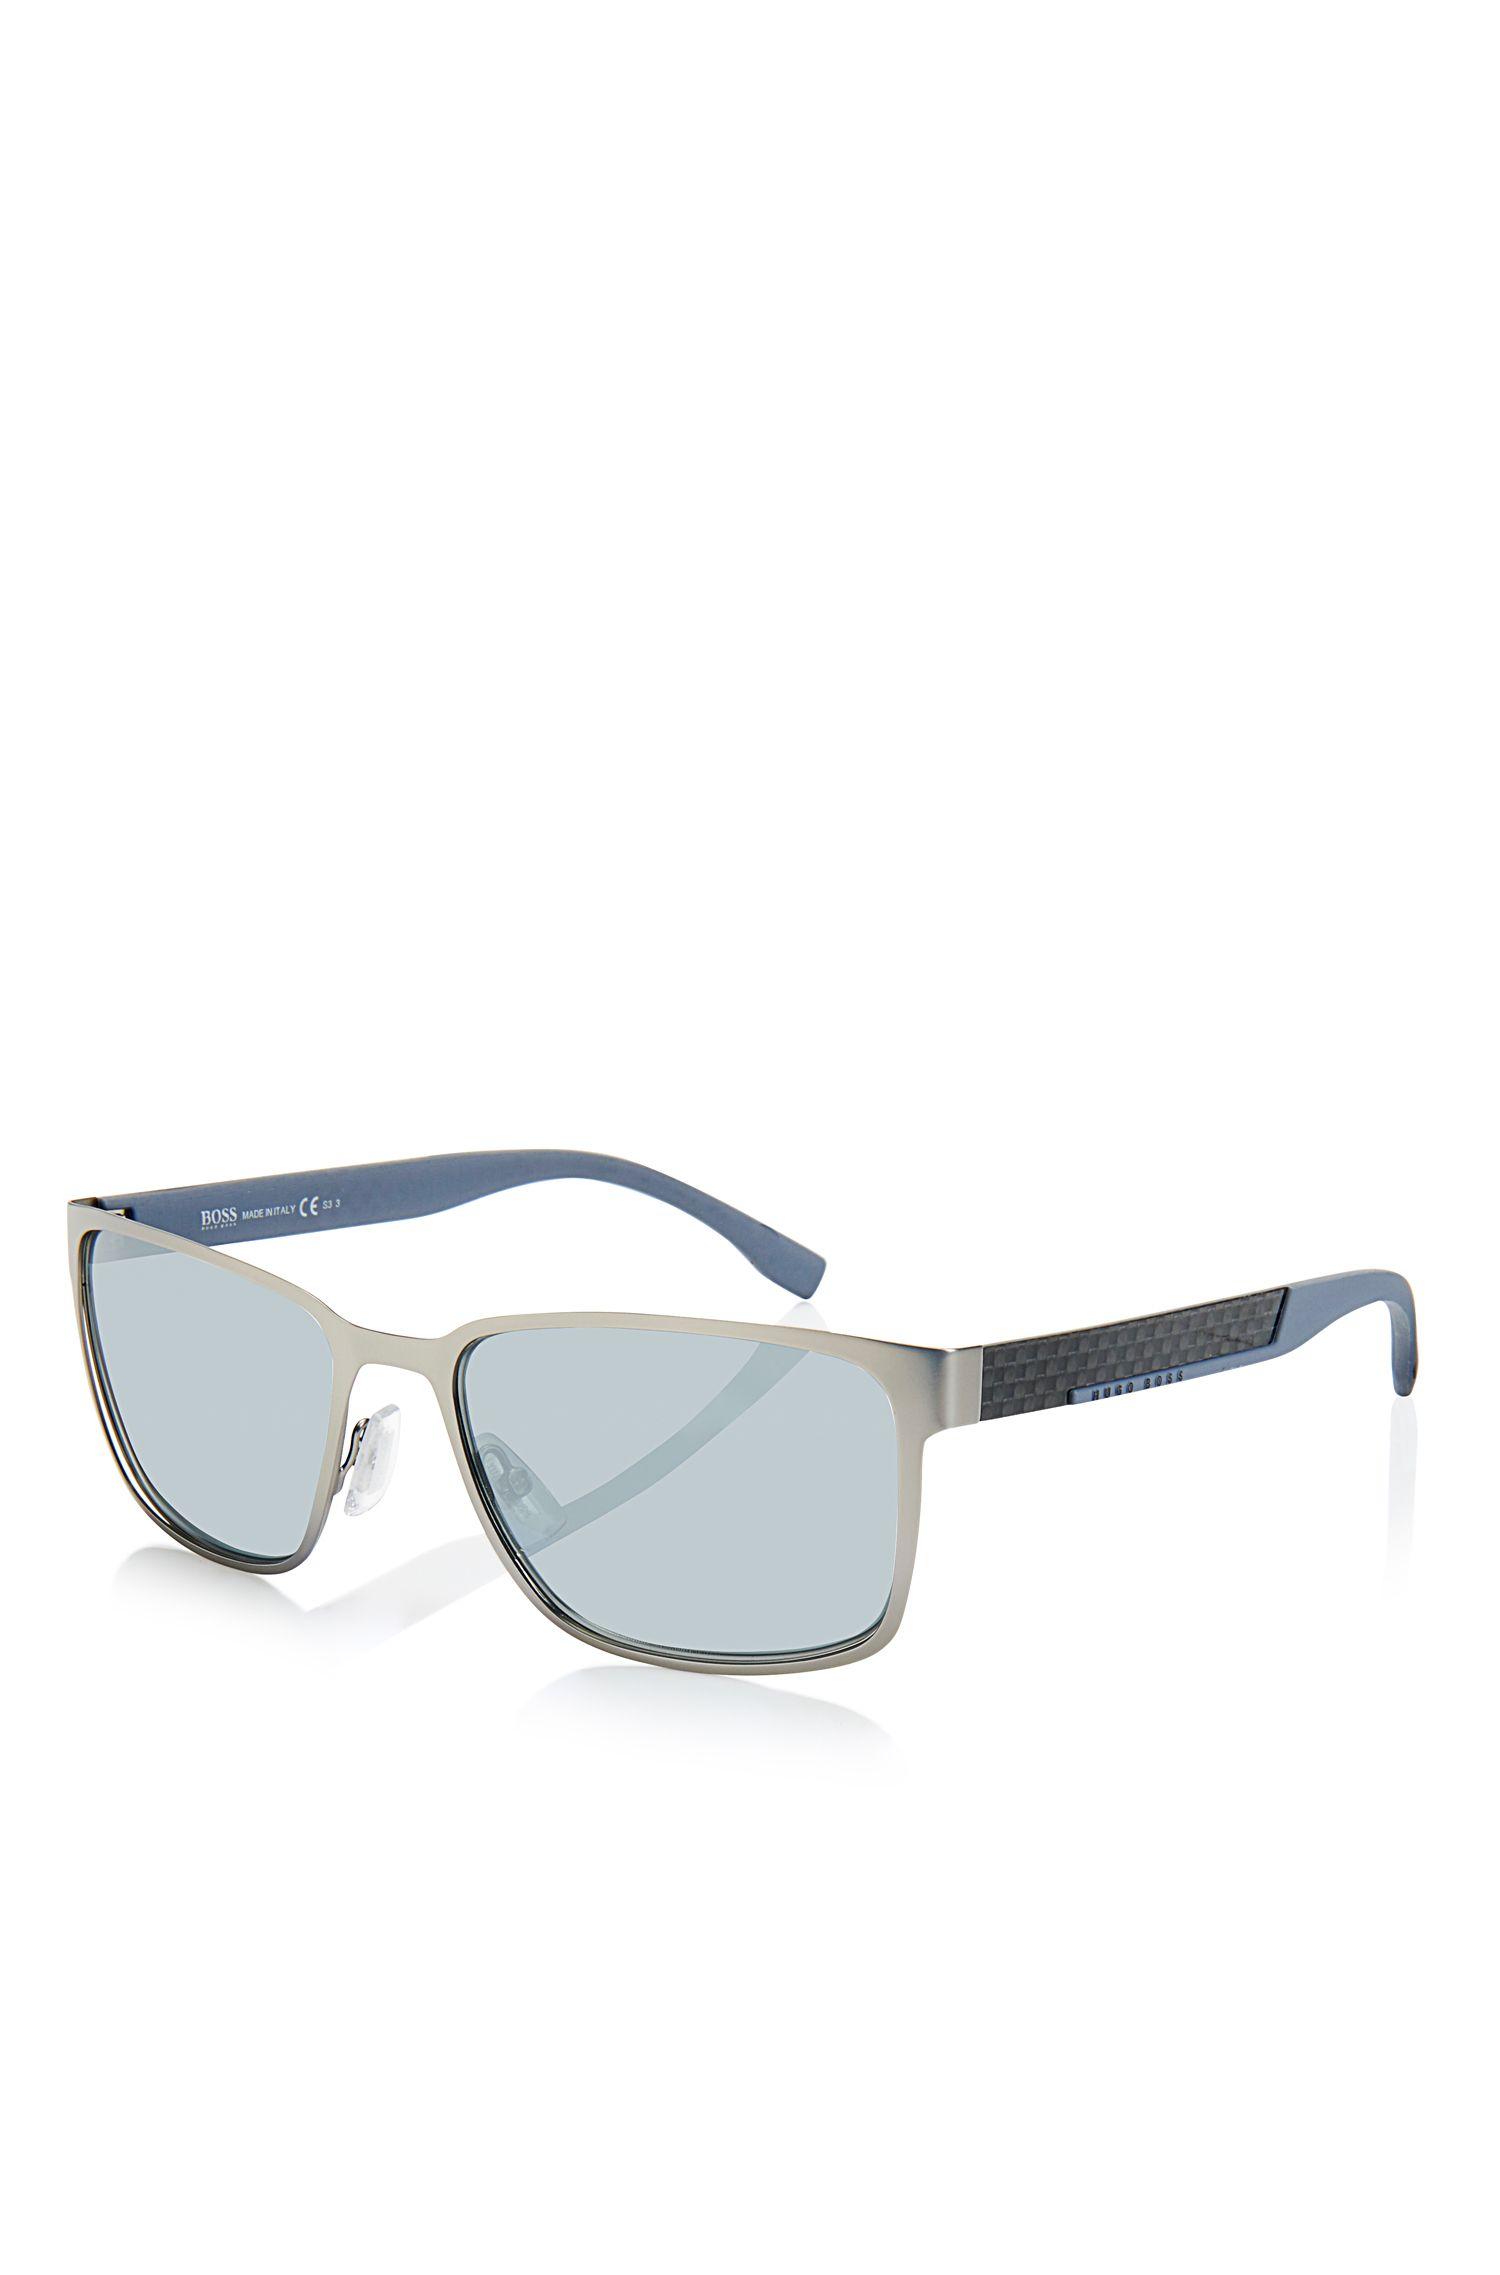 'Sunglasses' | Steel and Carbon Black Mirror Lens Sunglasses